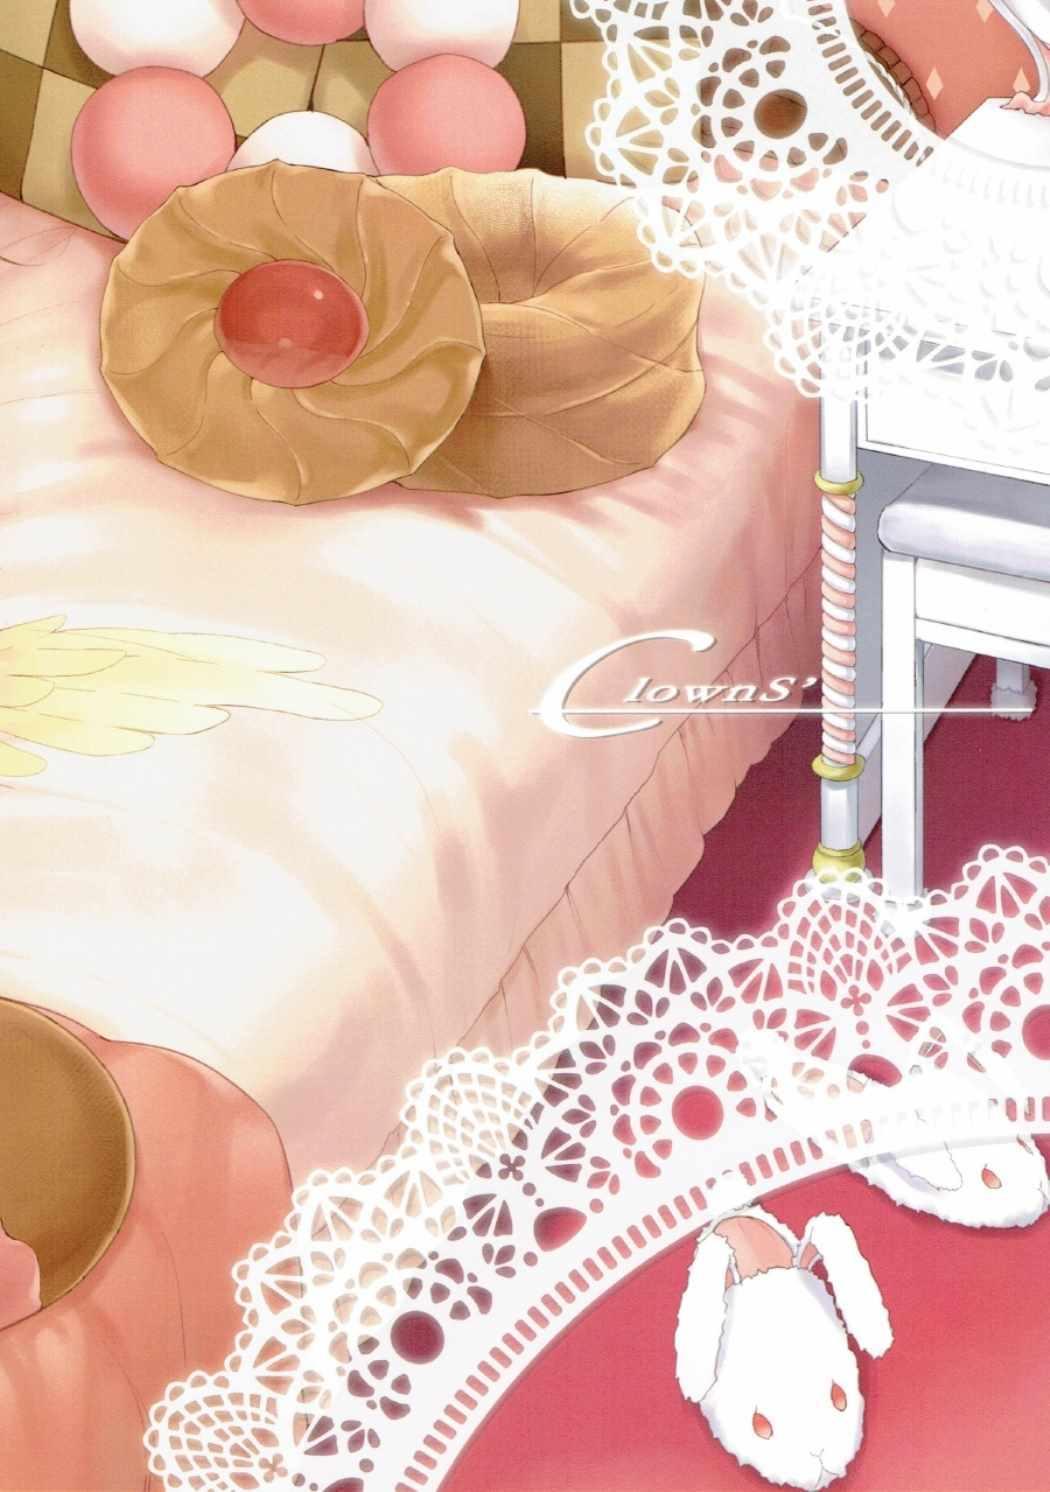 typeCu*01 Pocchari-kei Angel Buta 29